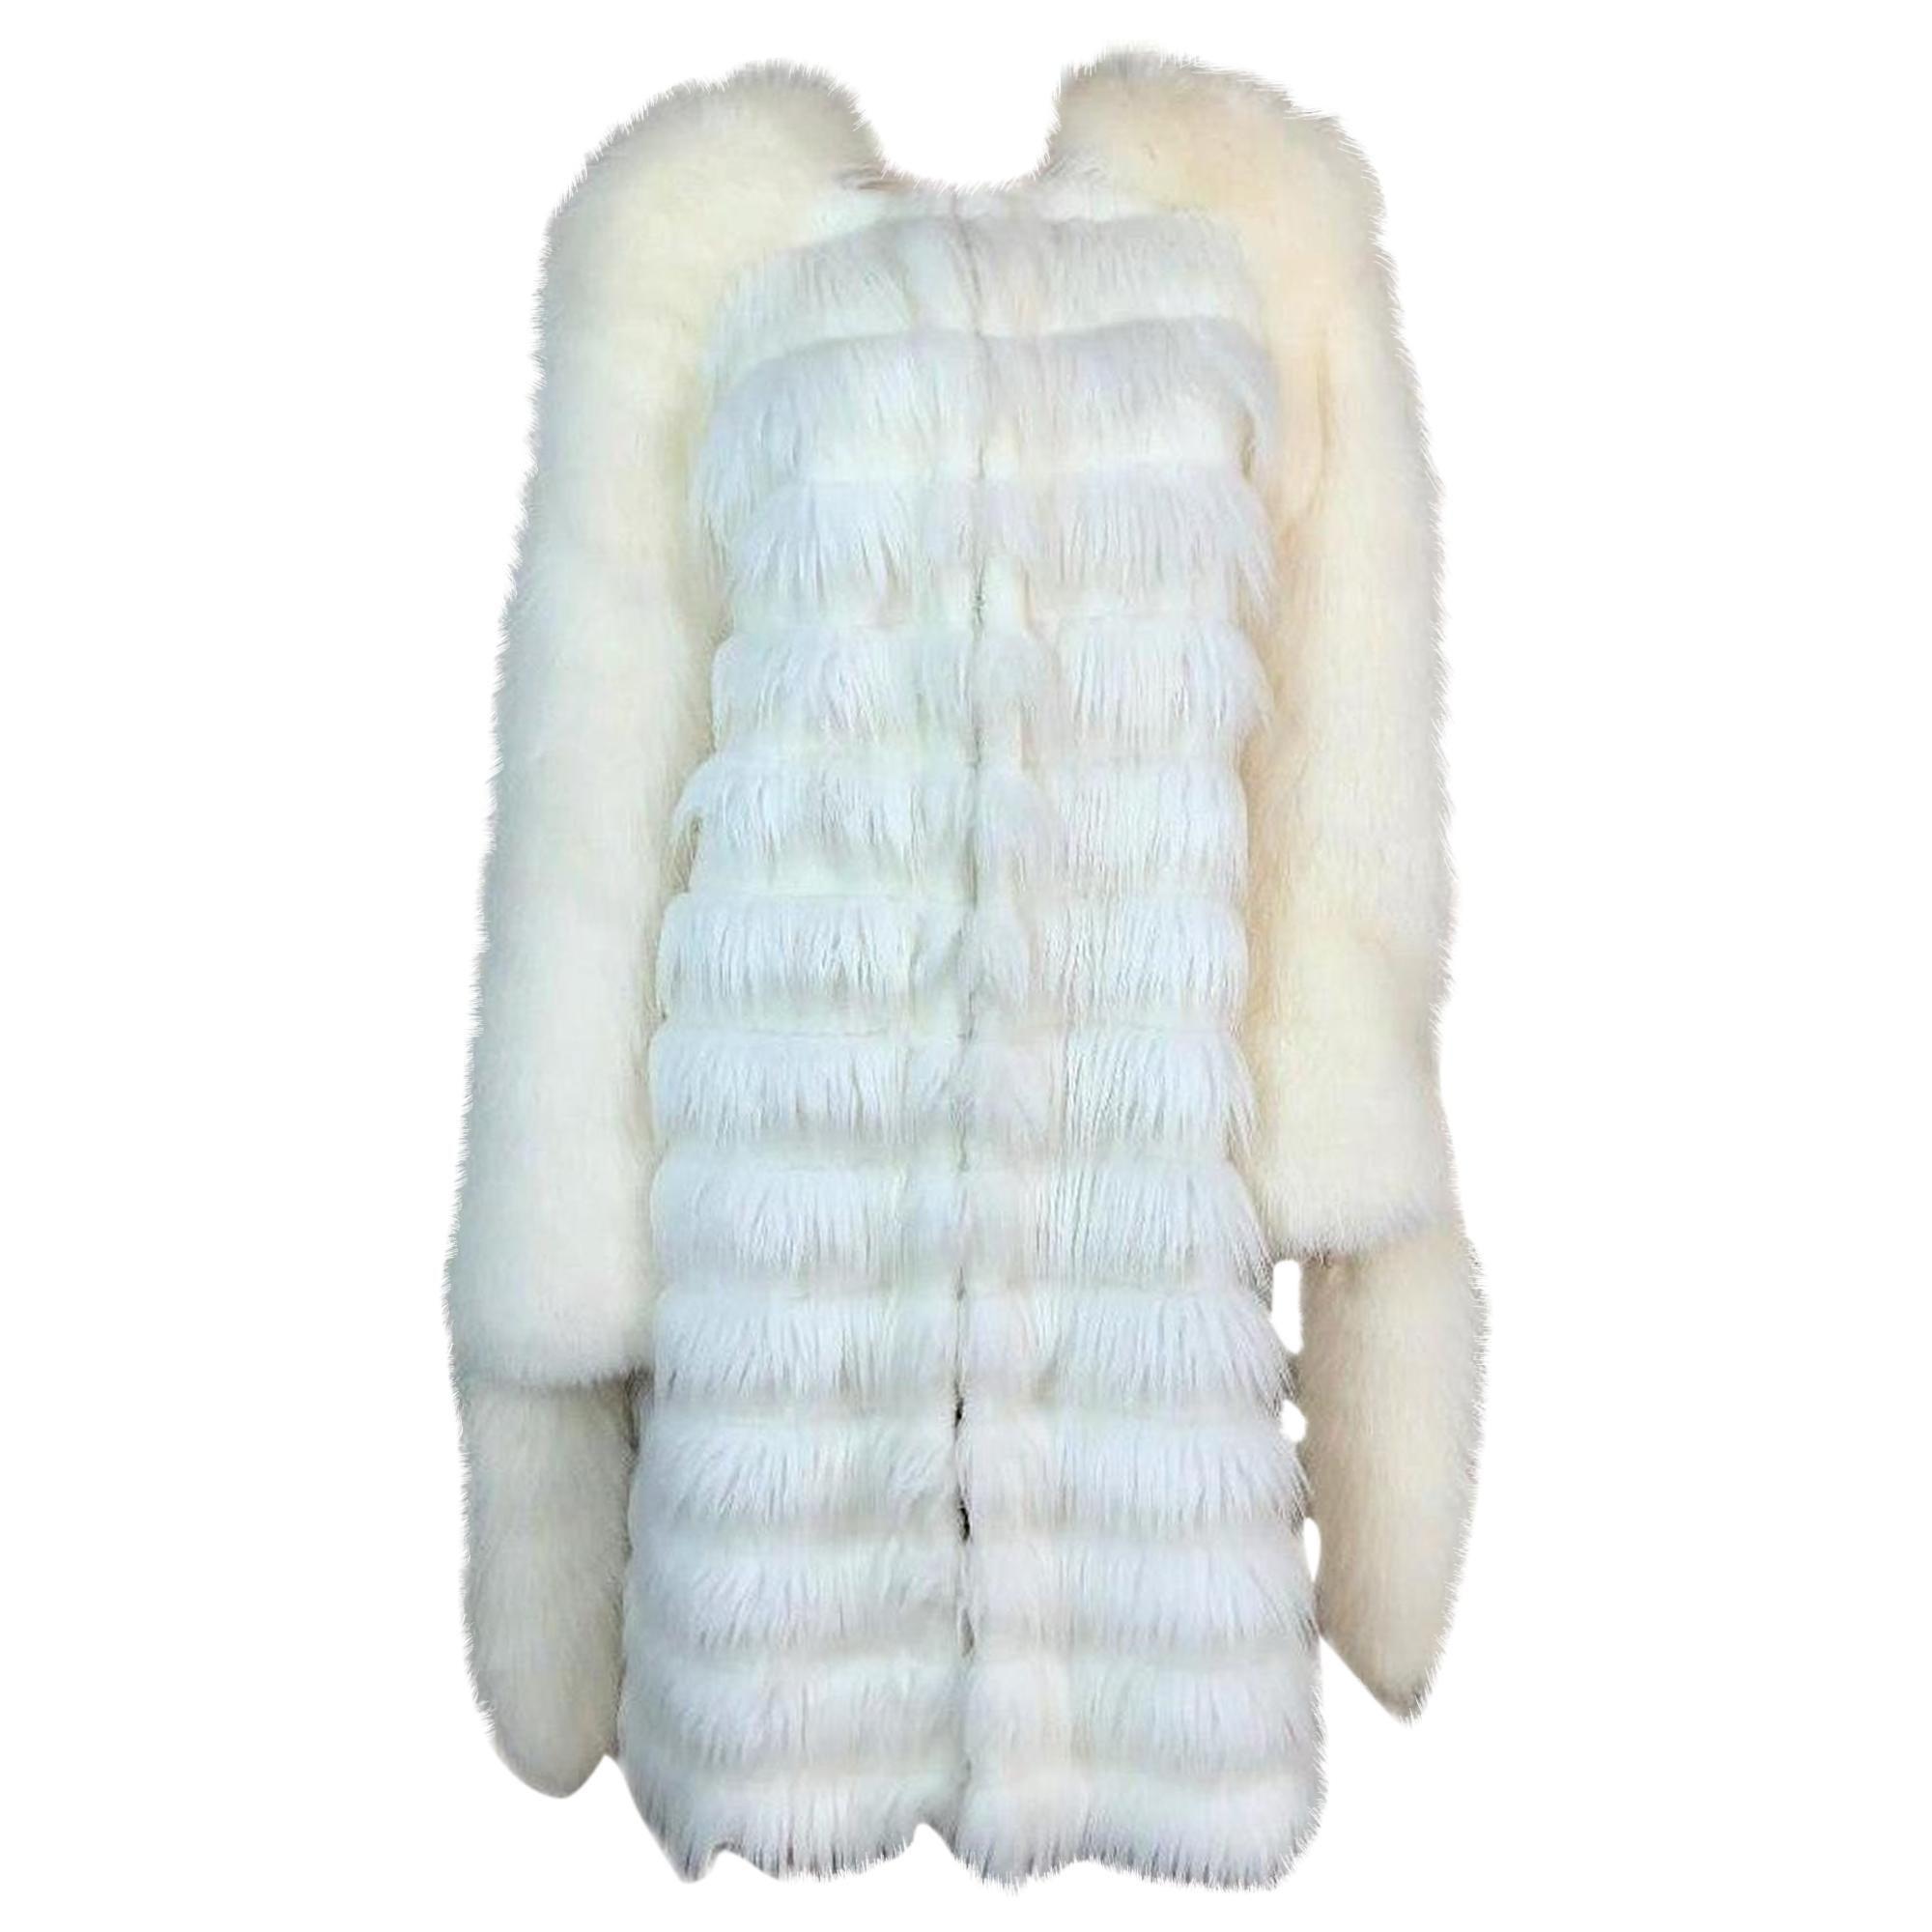 F/W 2003 Yves Saint Laurent Tom Ford Runway White Faux & Fox Fur Coat 38